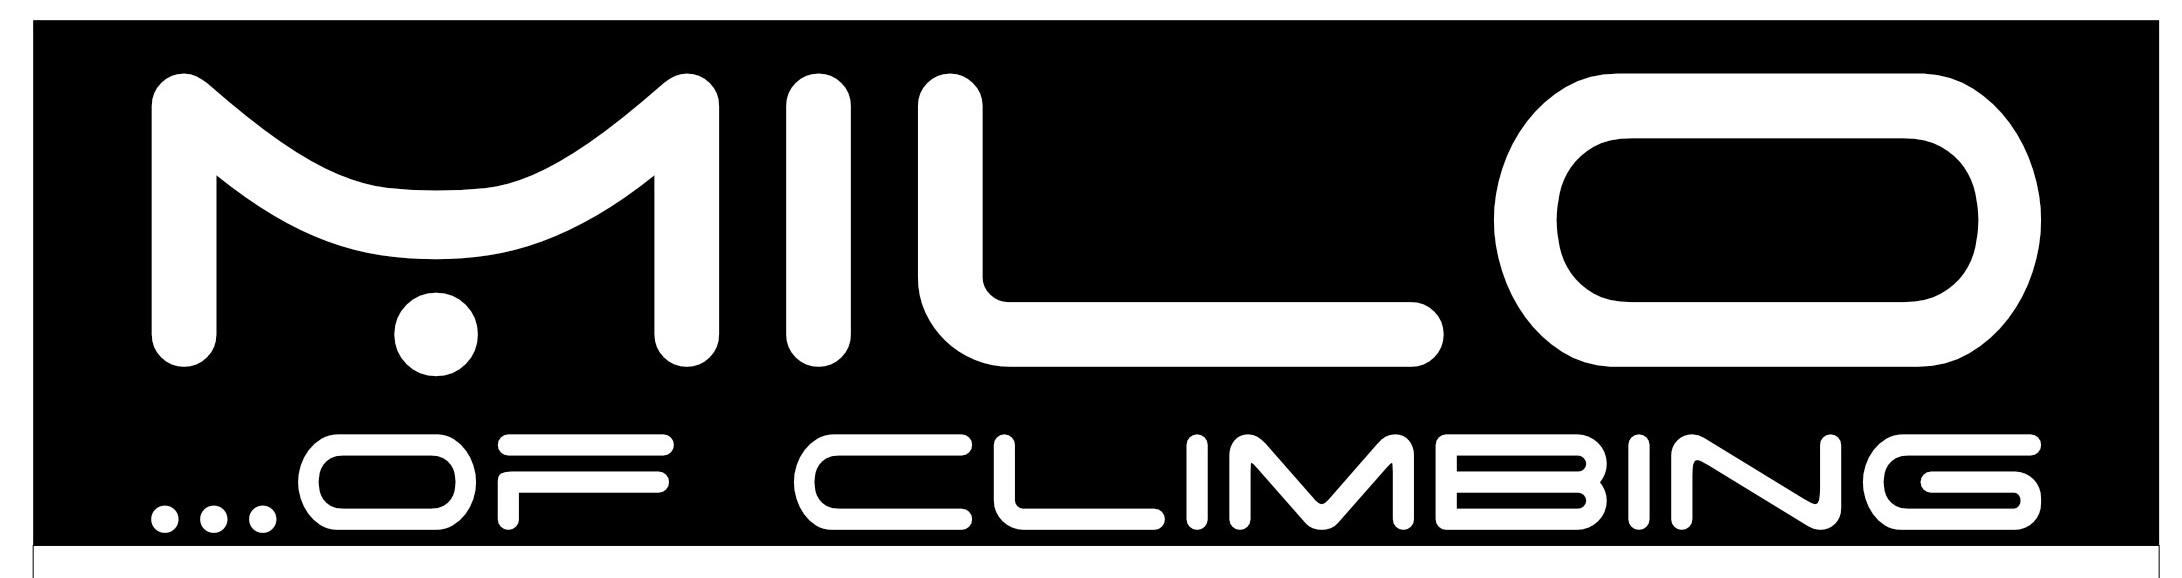 A4_logo_MILO_of_climbing_center_curves-0.jpg